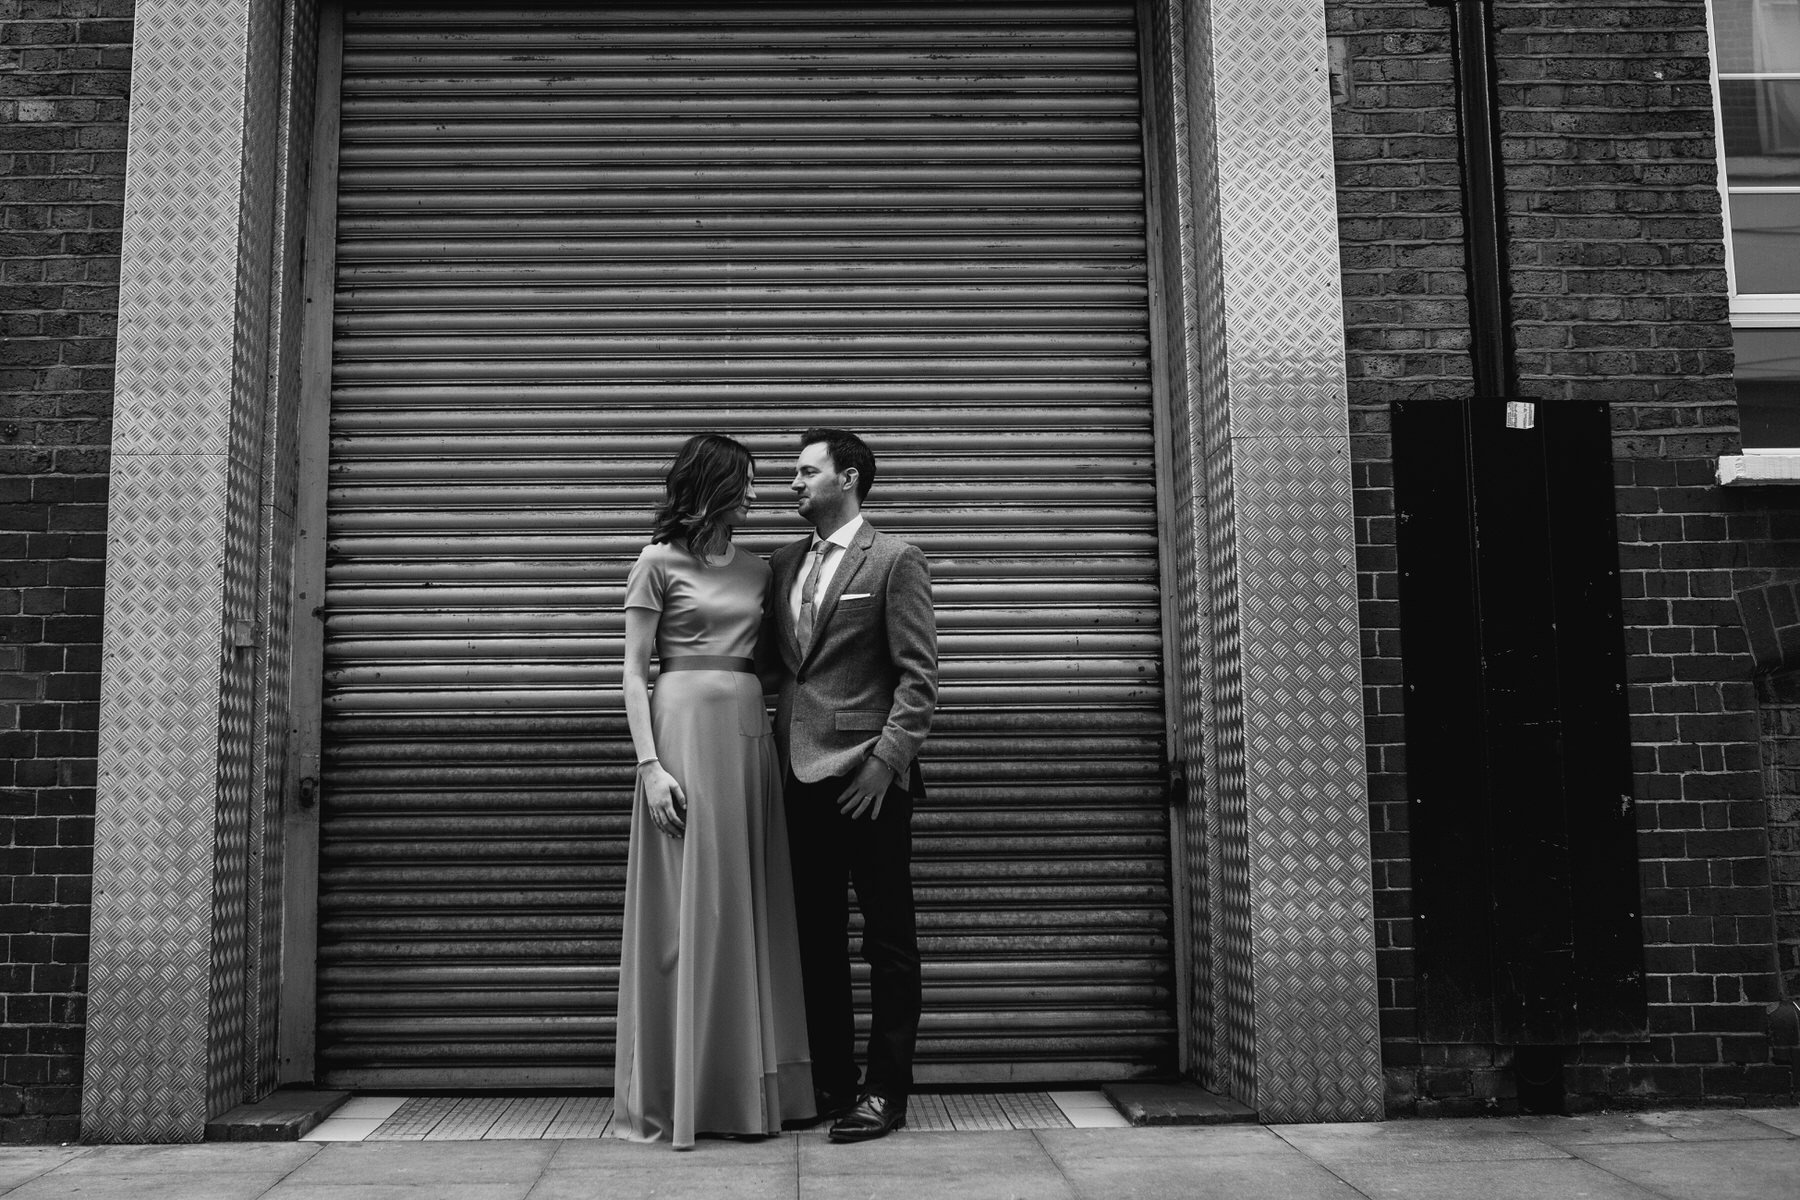 65-St Chads Place BW couple portrait against metal door.jpg